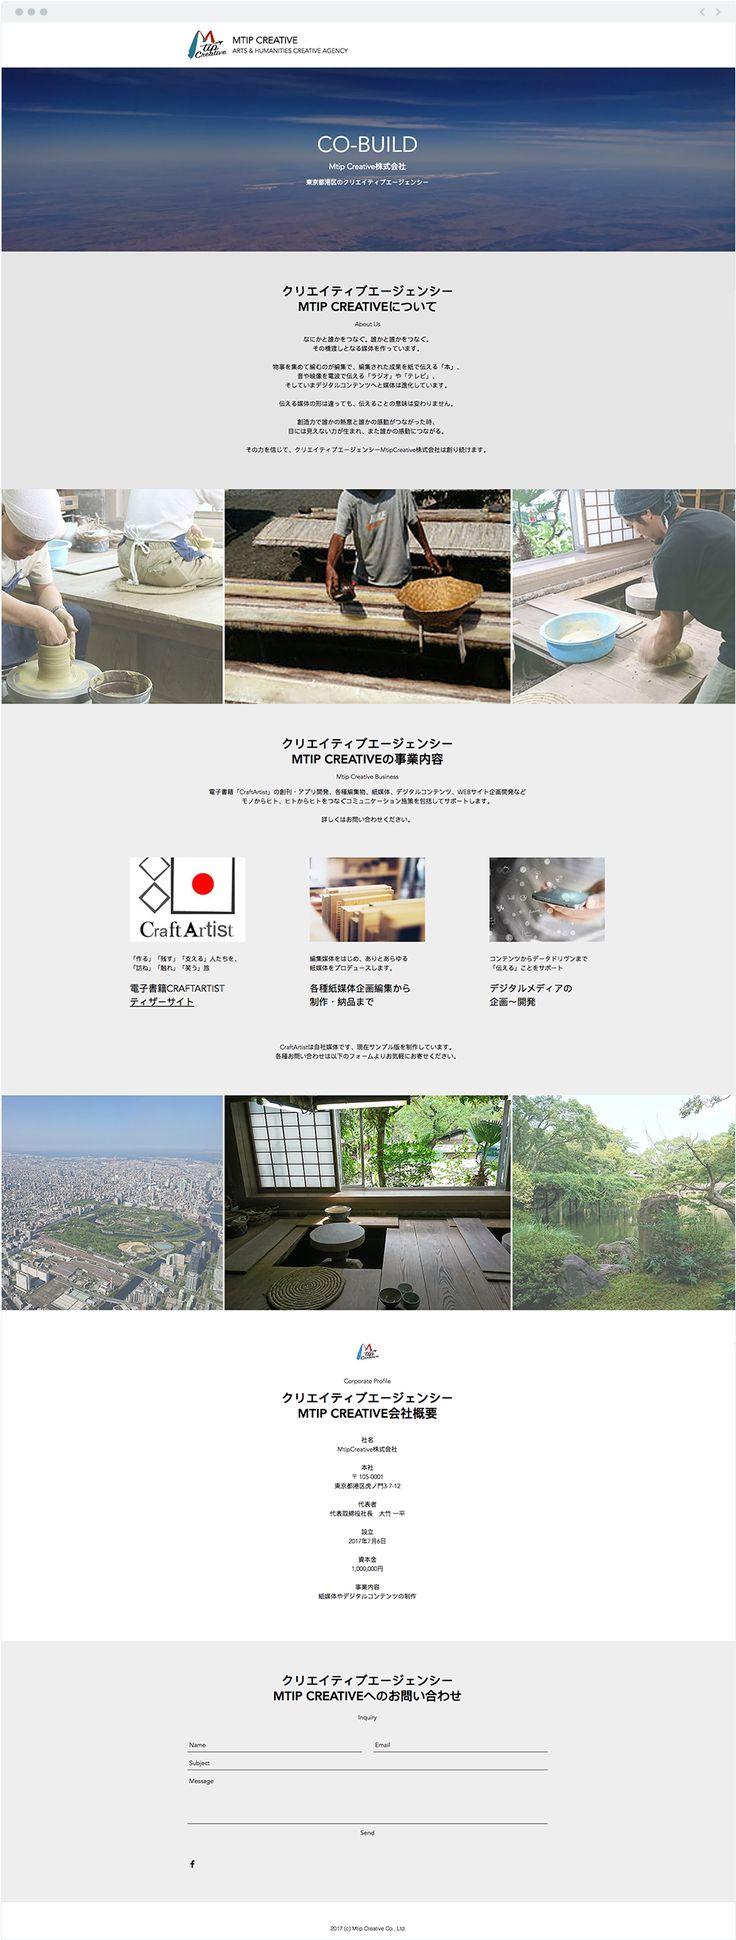 Mtip Creative | Arts & Humanities Creative Agency